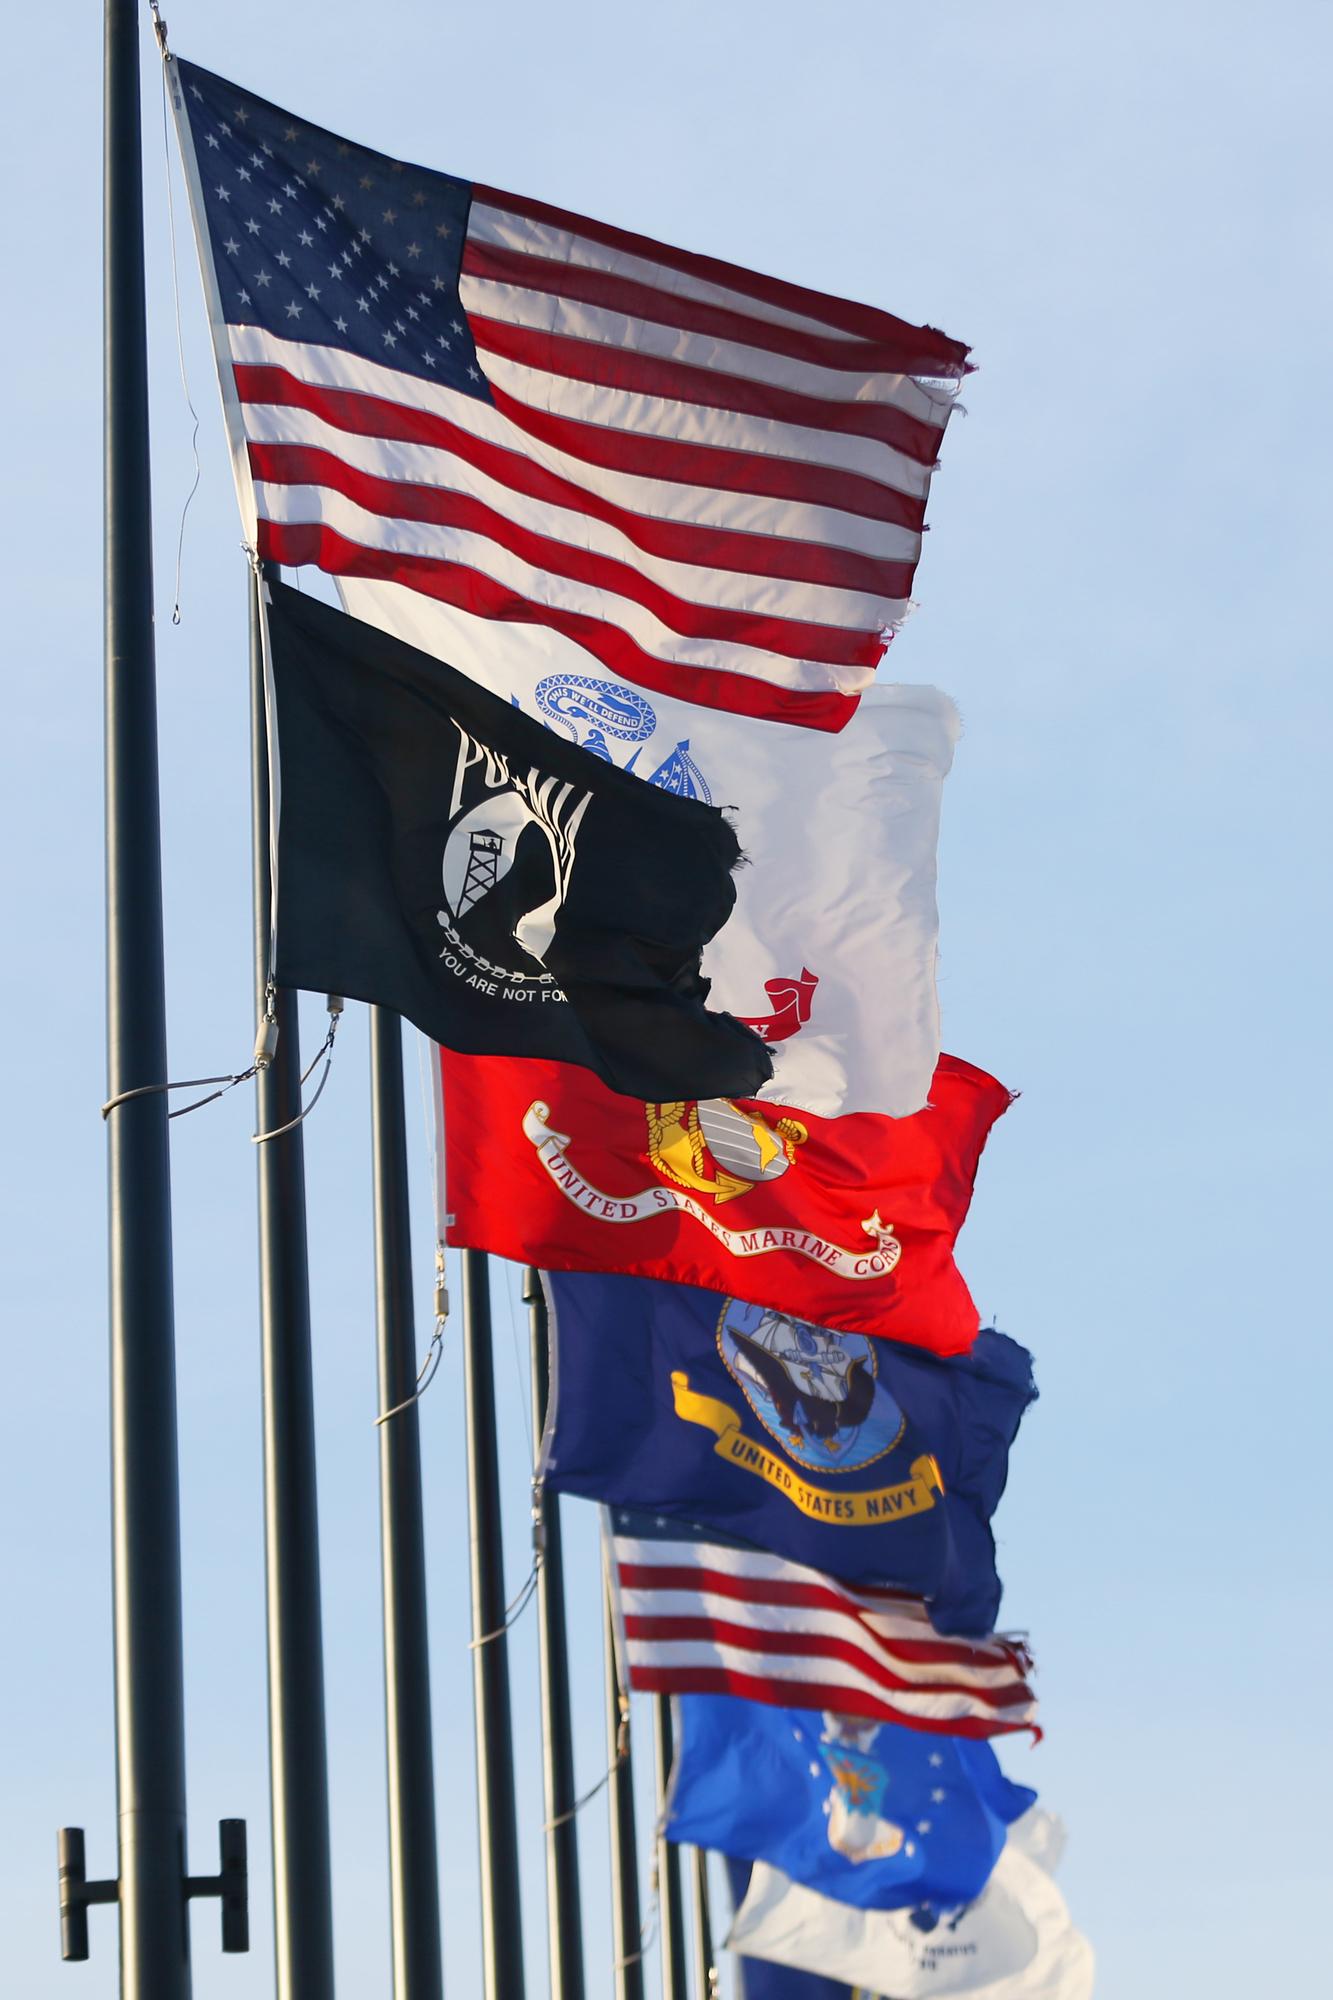 military and POW/MIA flags